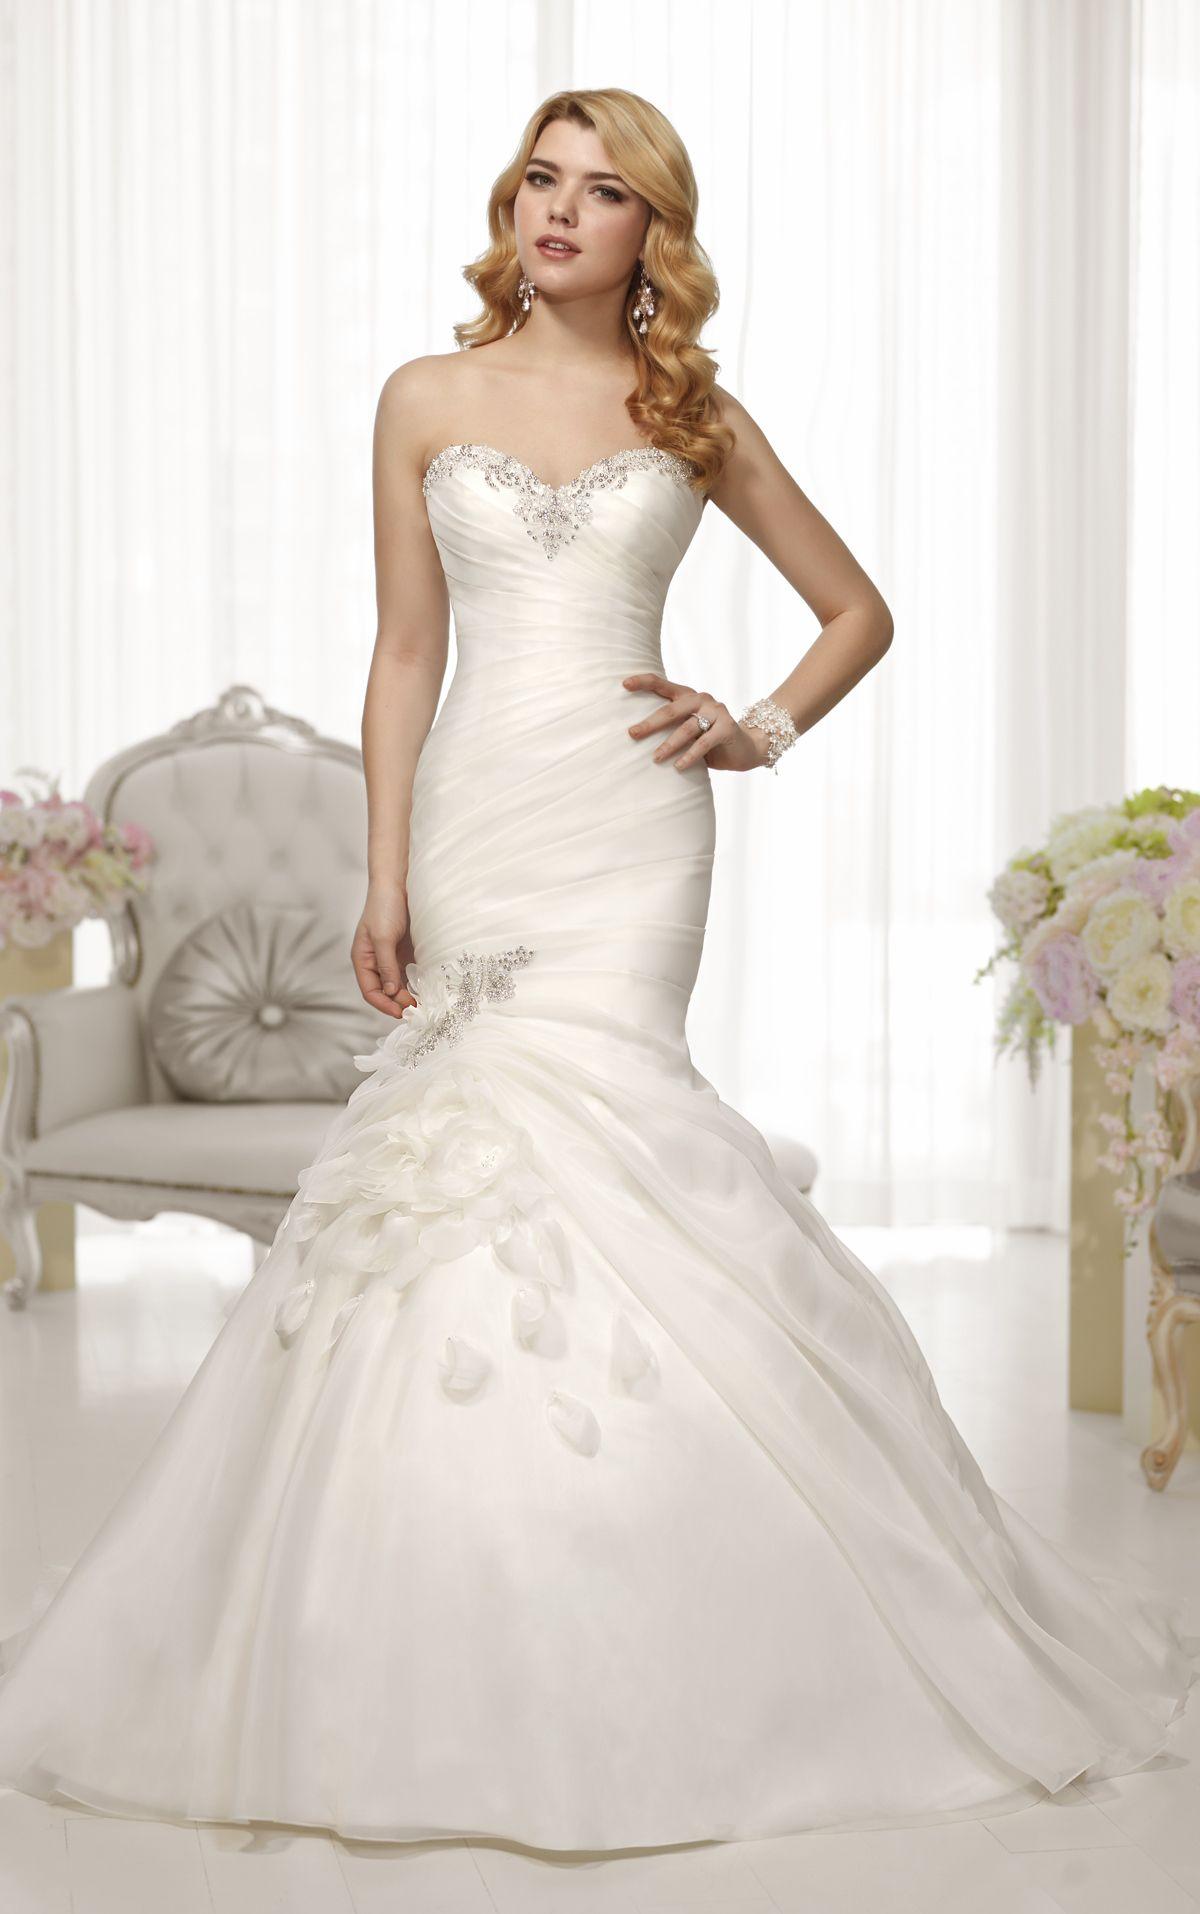 Essense wedding dress  essence of australia   Bridal collection Bridal designers and